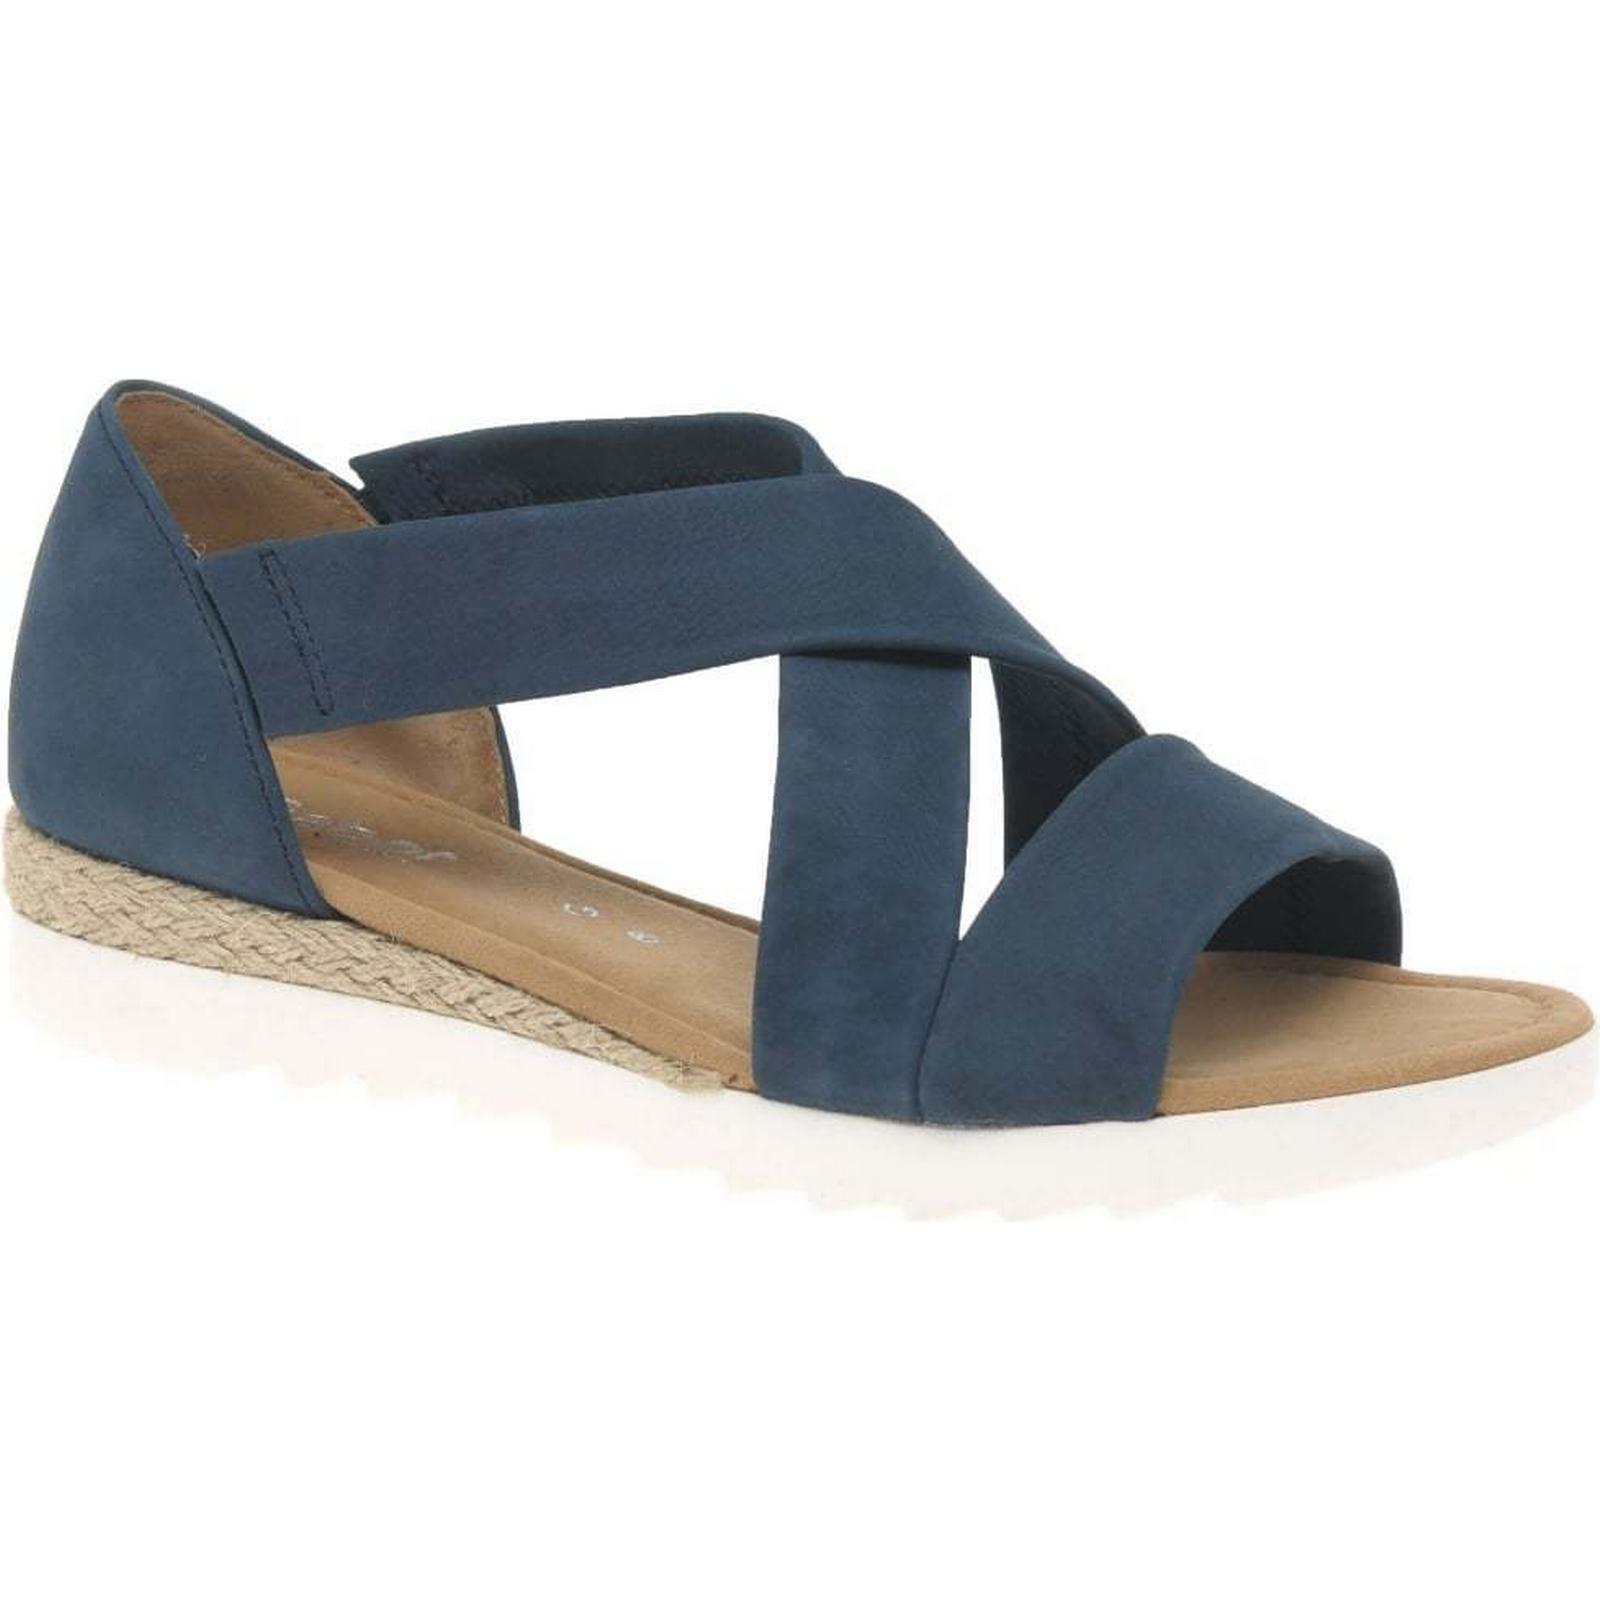 Gabor Promise Navy Womens Sandals Colour: Navy Promise Nubuck, Size: 7.5 4811dd